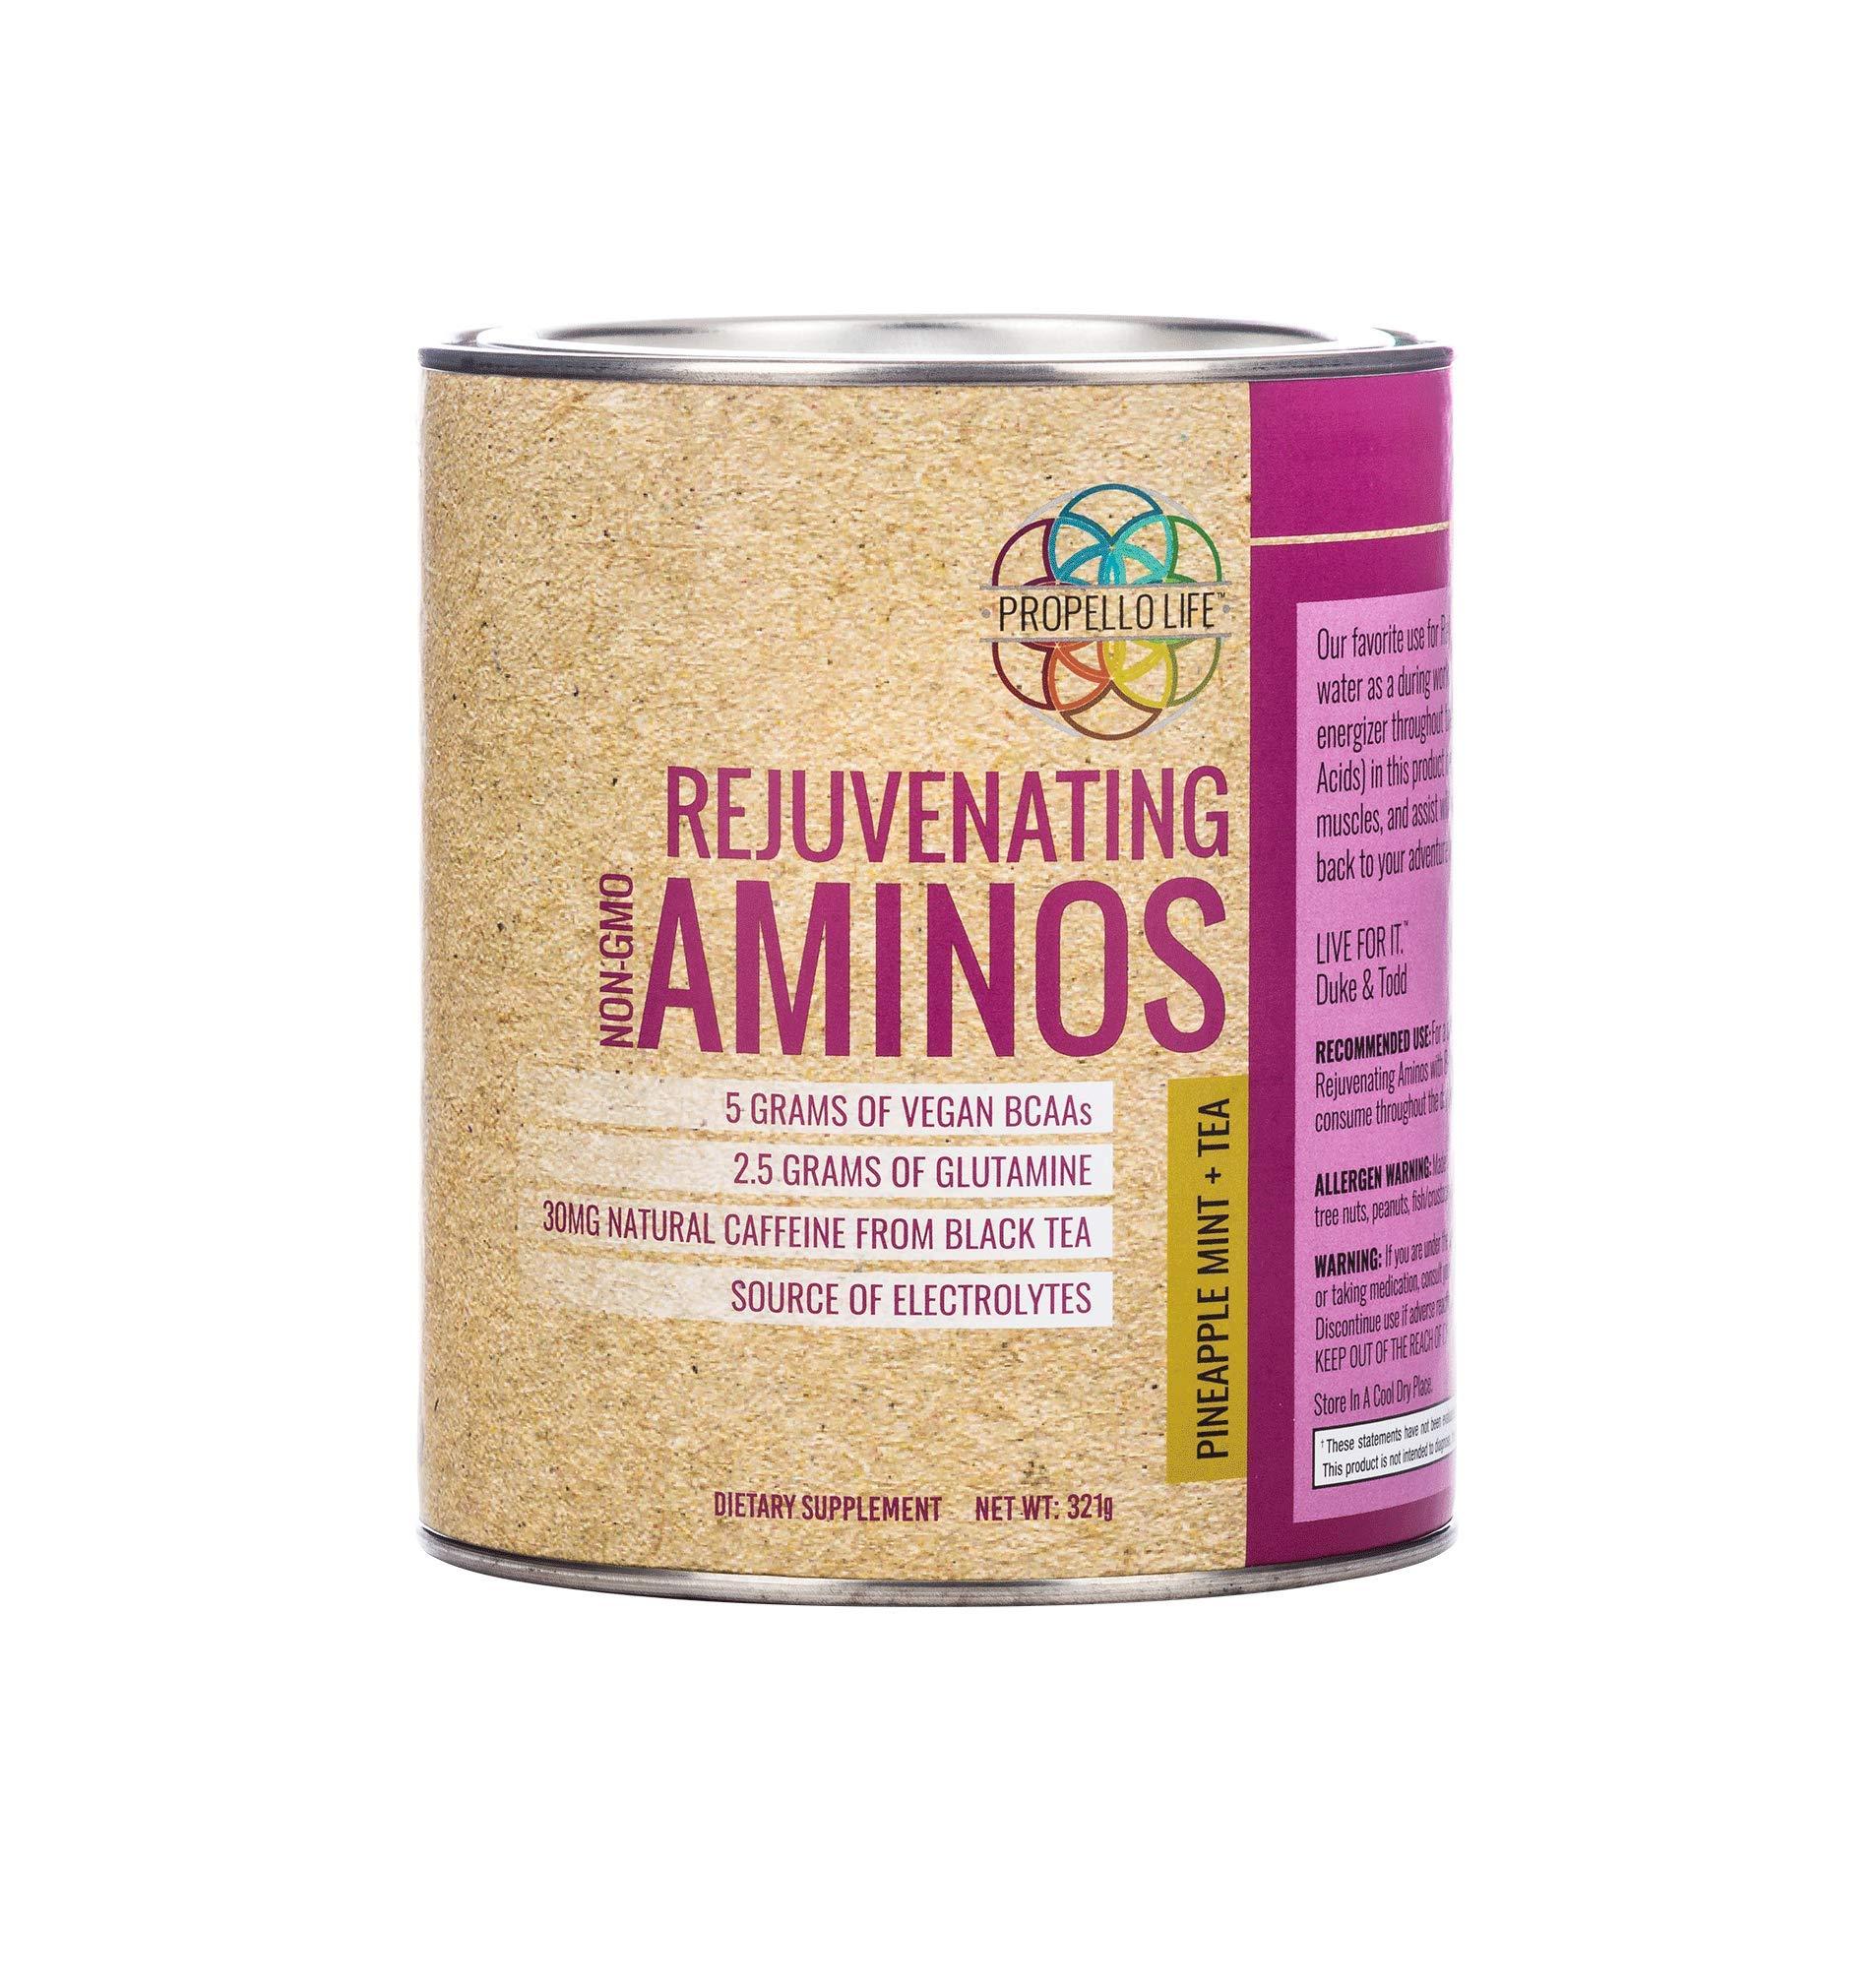 Propello Life Rejuvenating Aminos, Pineapple Mint + Tea, 321 Gram